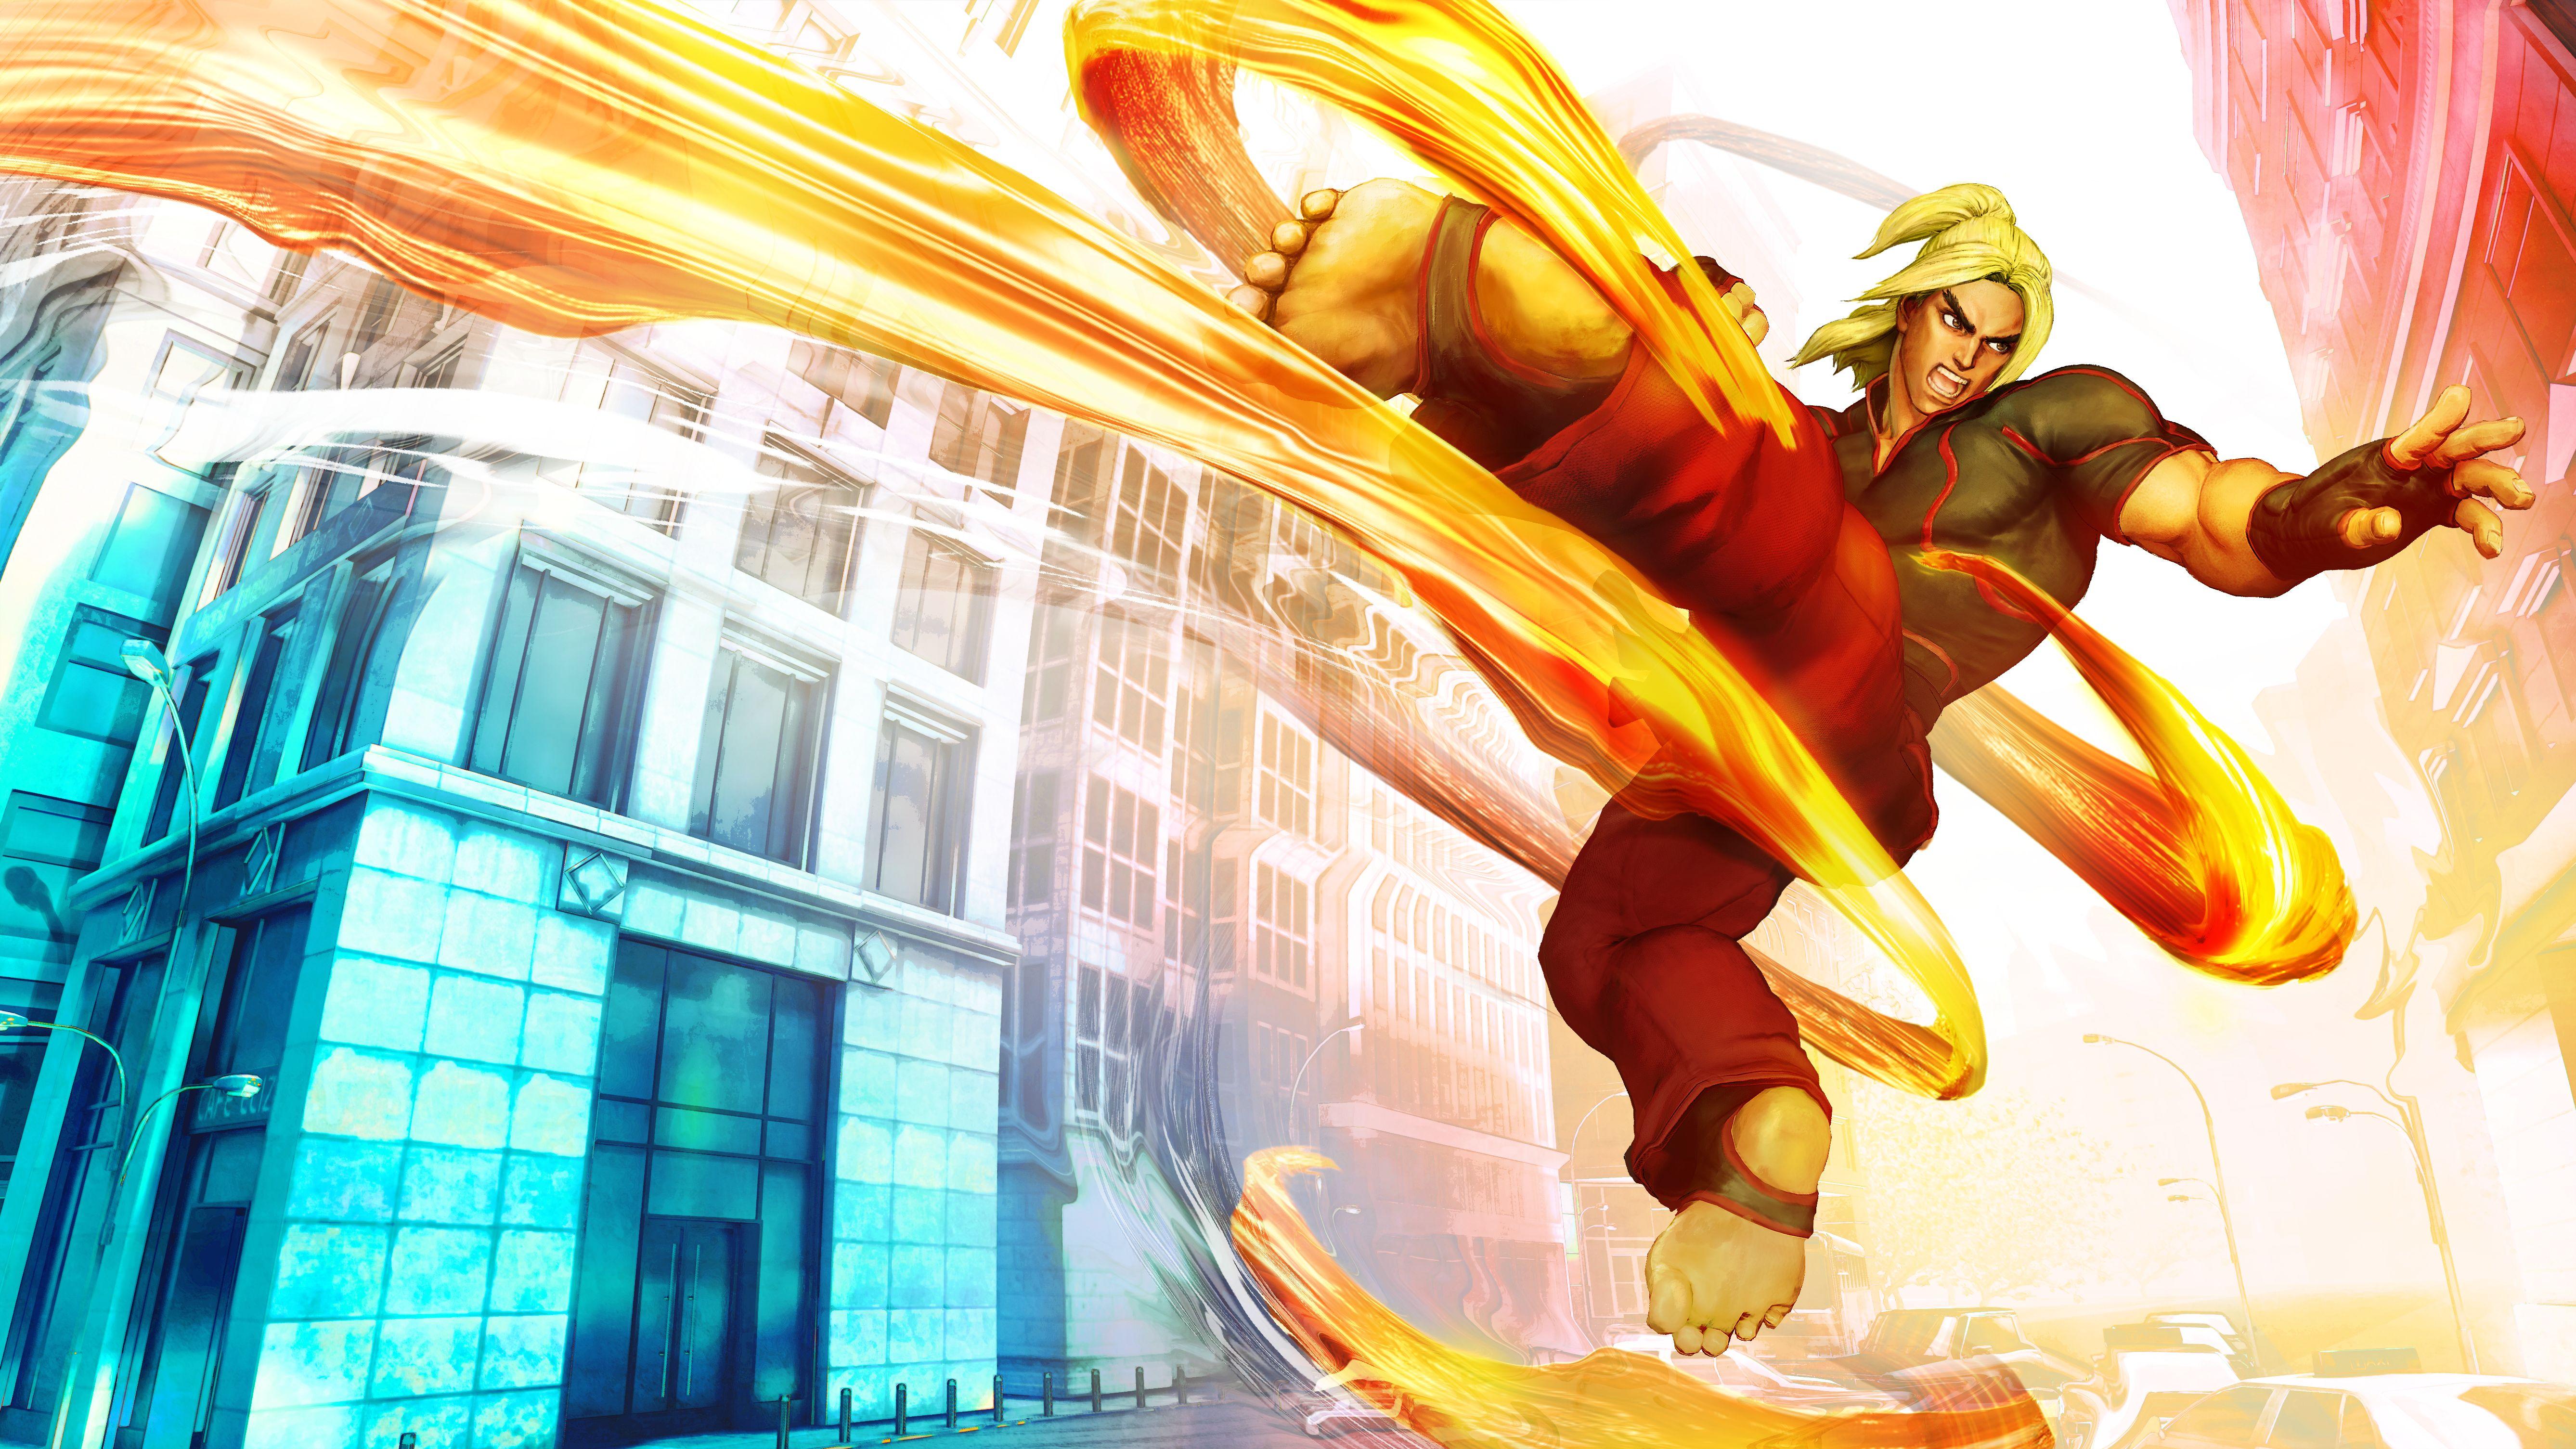 Street Fighter V 5k Retina Ultra HD Wallpaper and ...